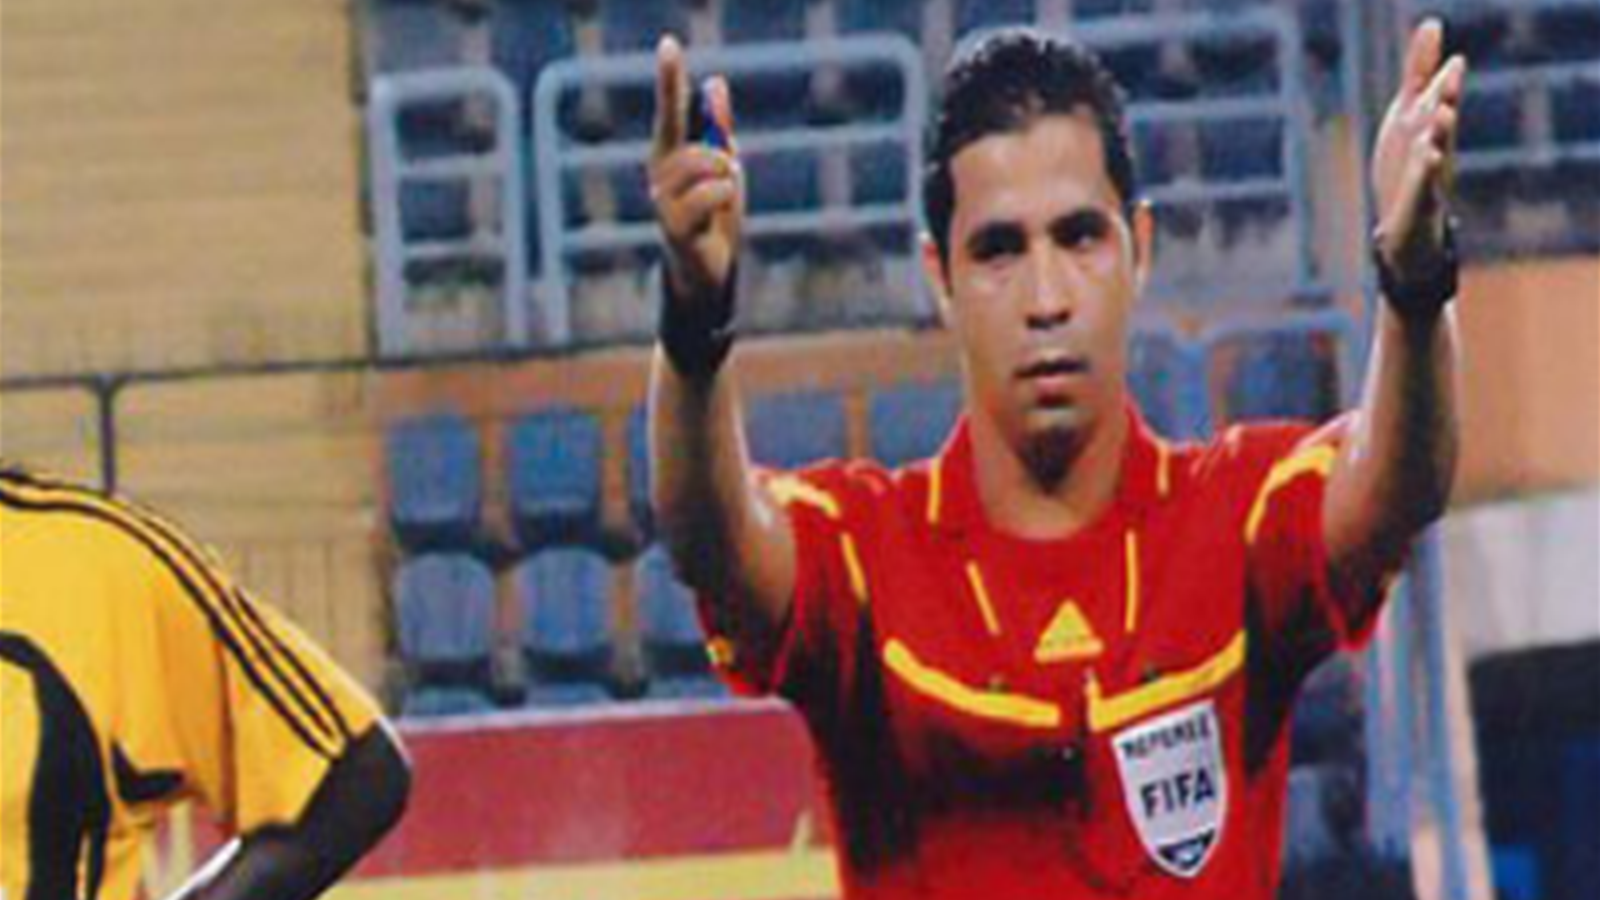 فيديو...حكام متهمون بإفساد الدوري المصري